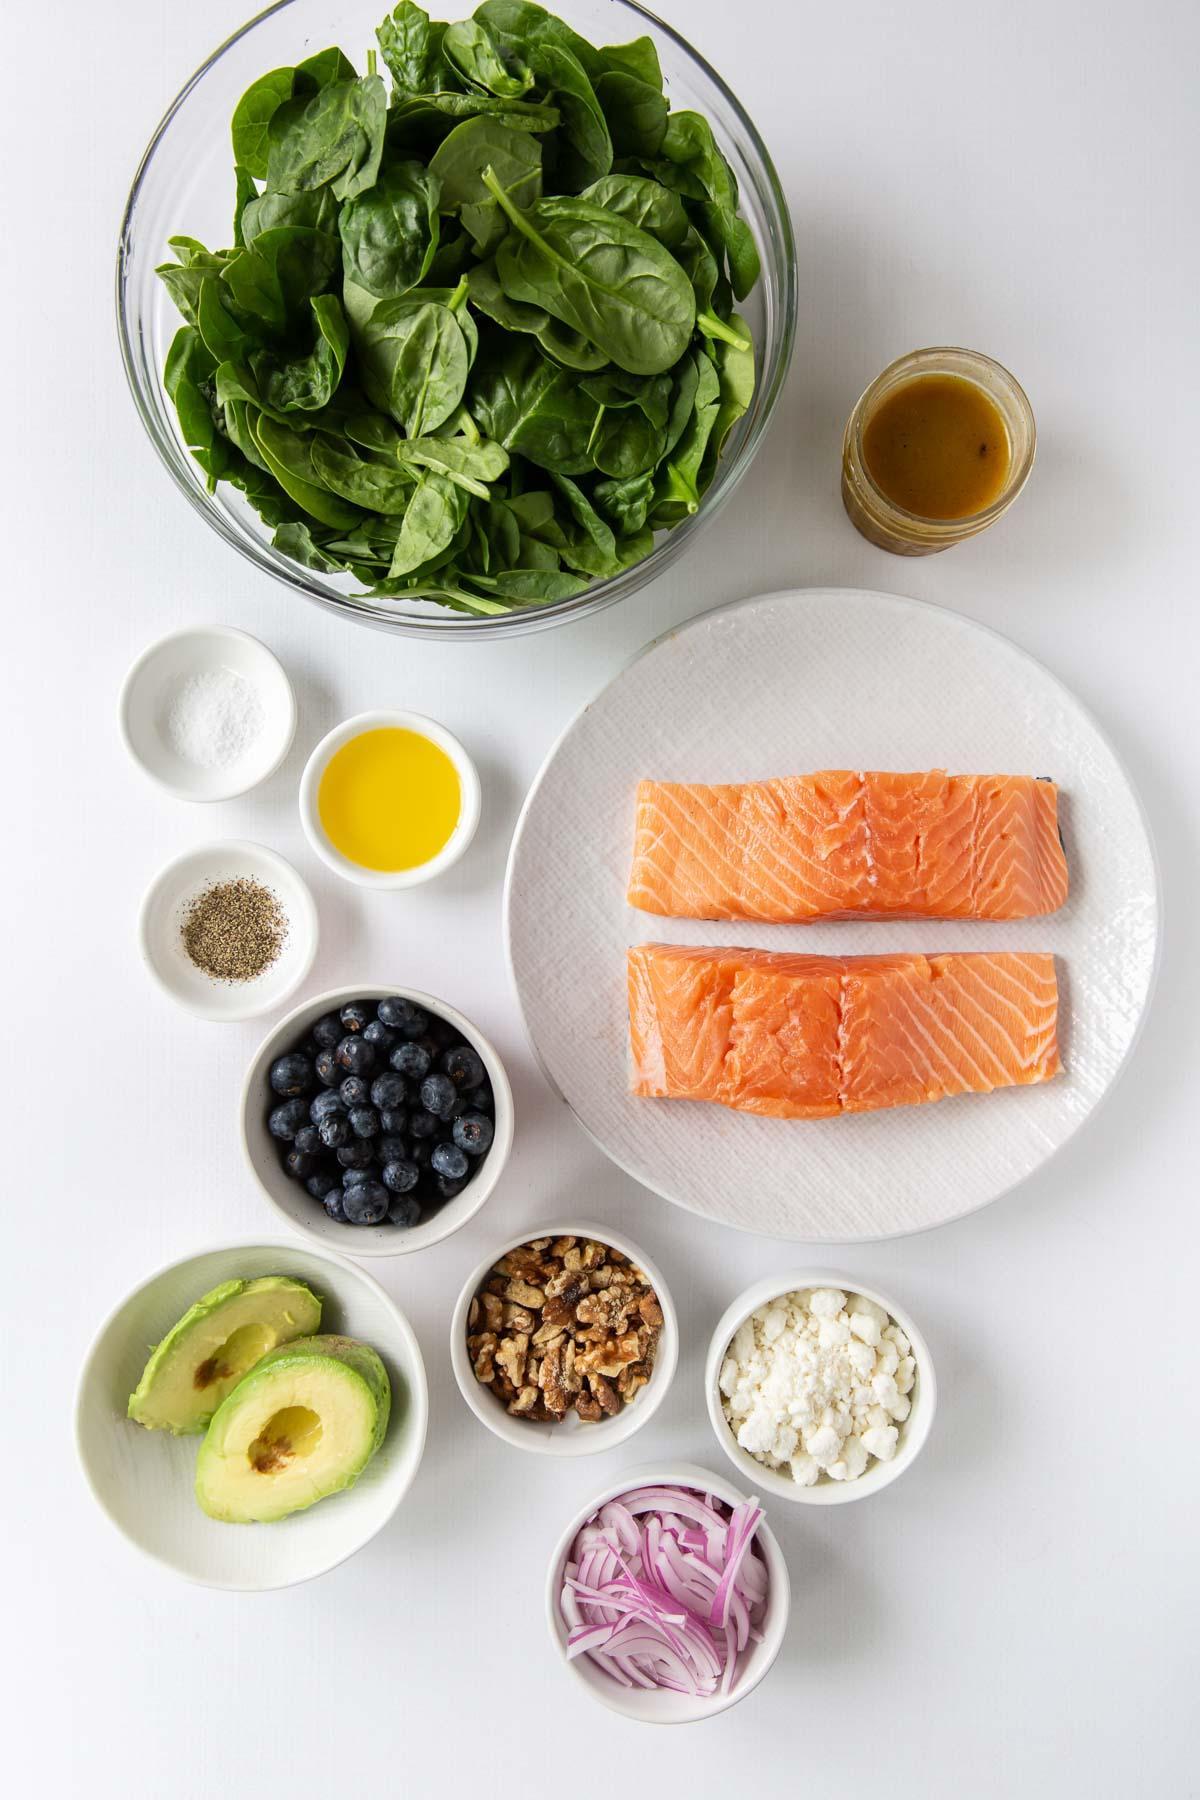 ingredients for salmon salad recipe